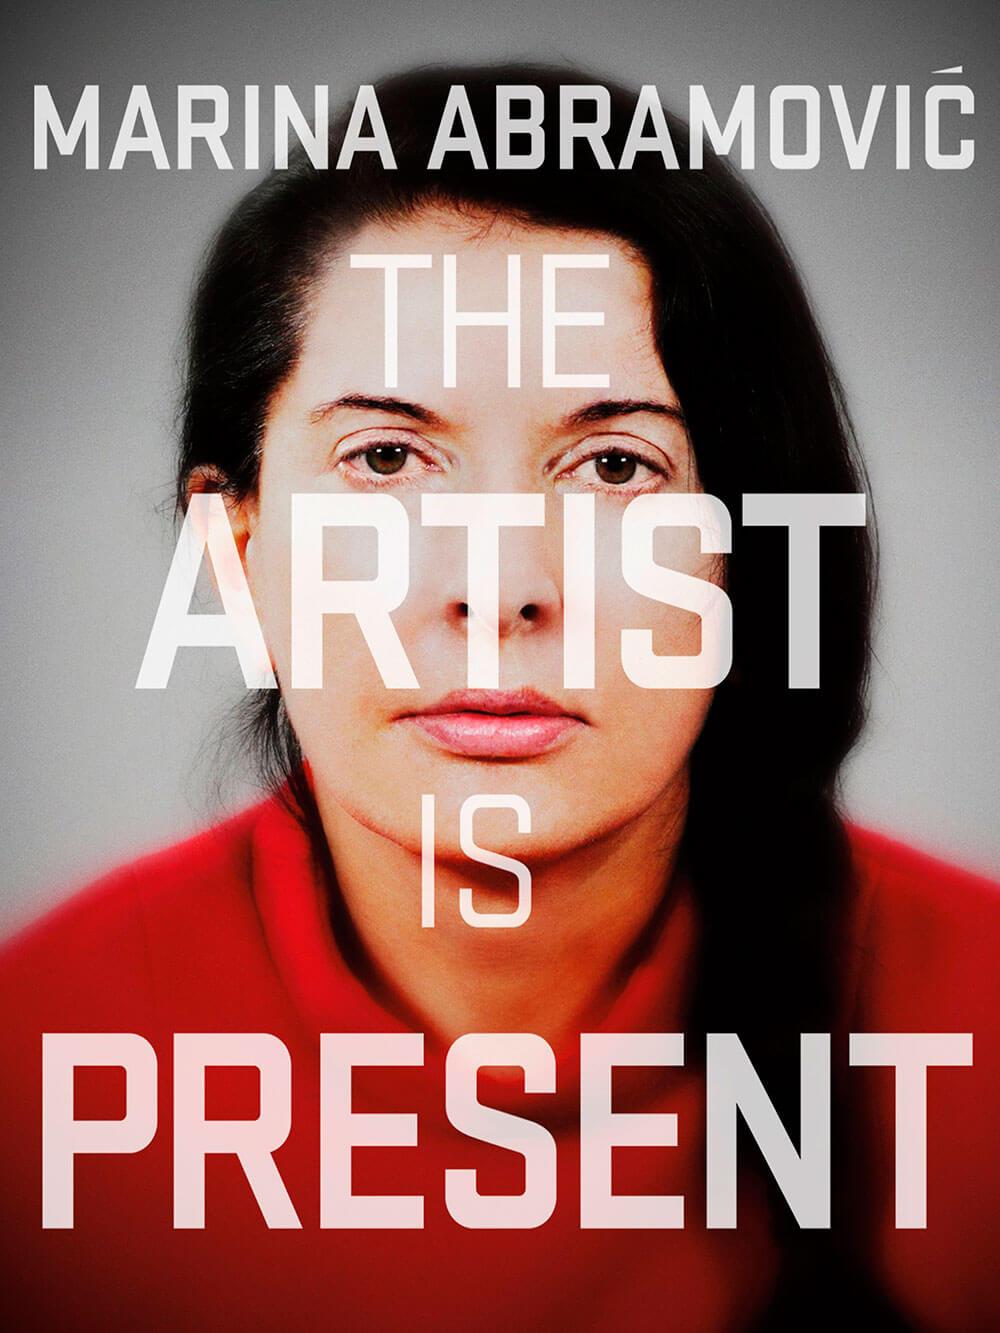 Marina-Abramovic--The-Artist-is-Present-1.jpg